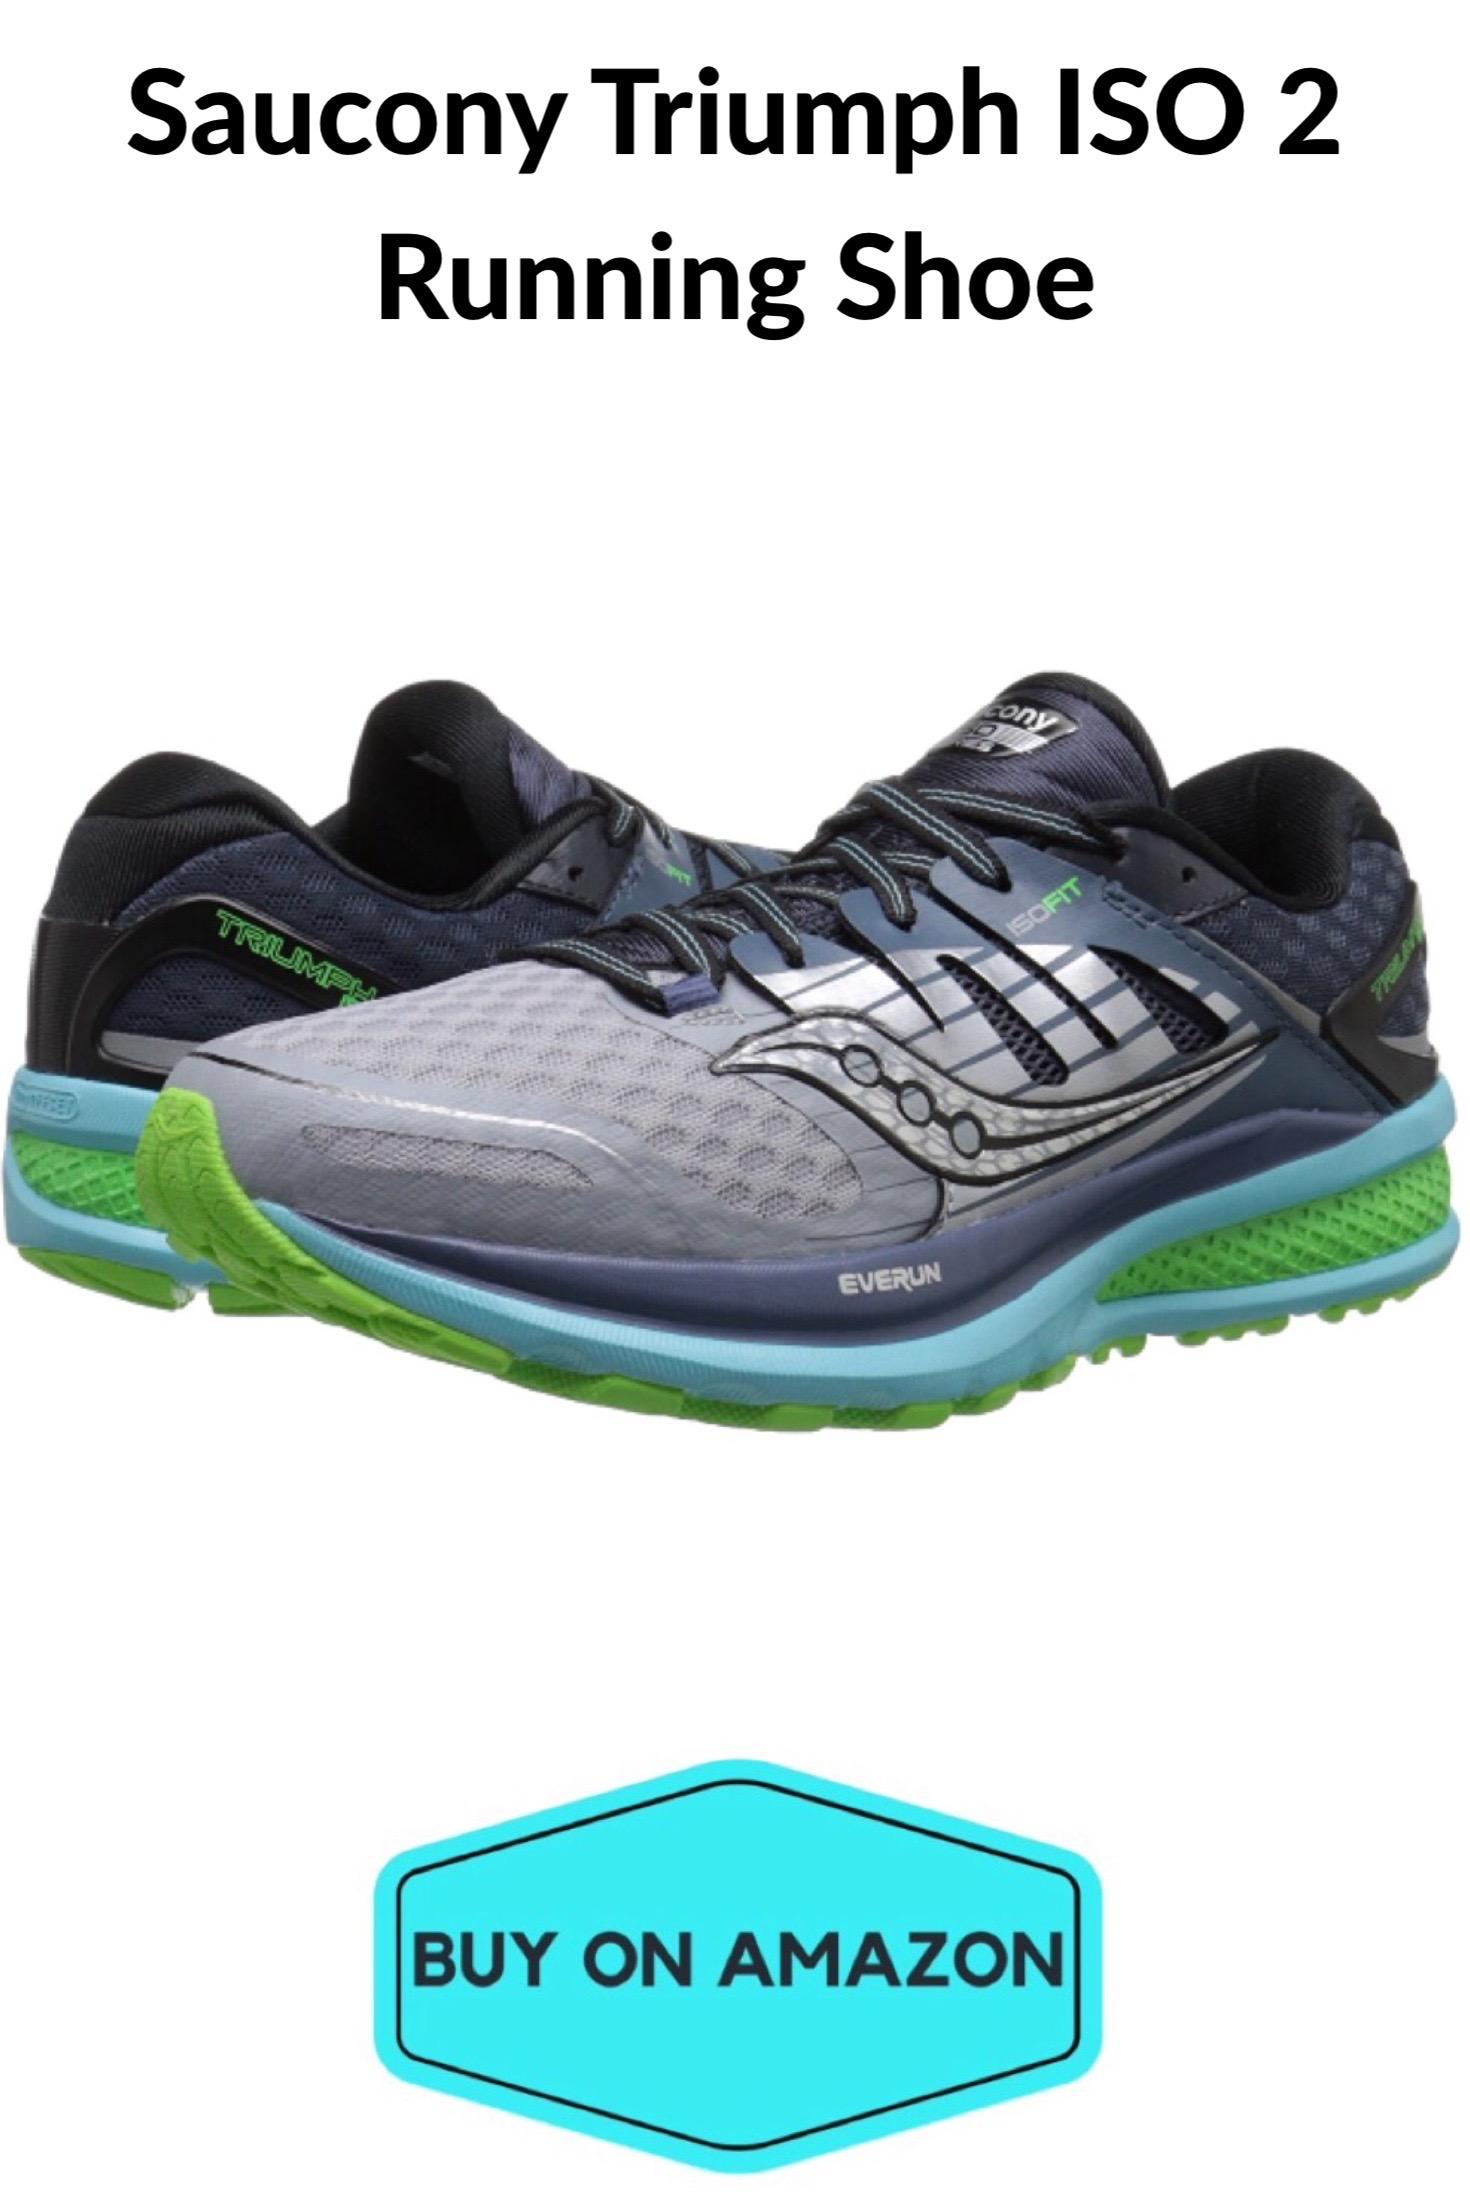 Saucony Triumph ISO 2 Women's Running Shoe